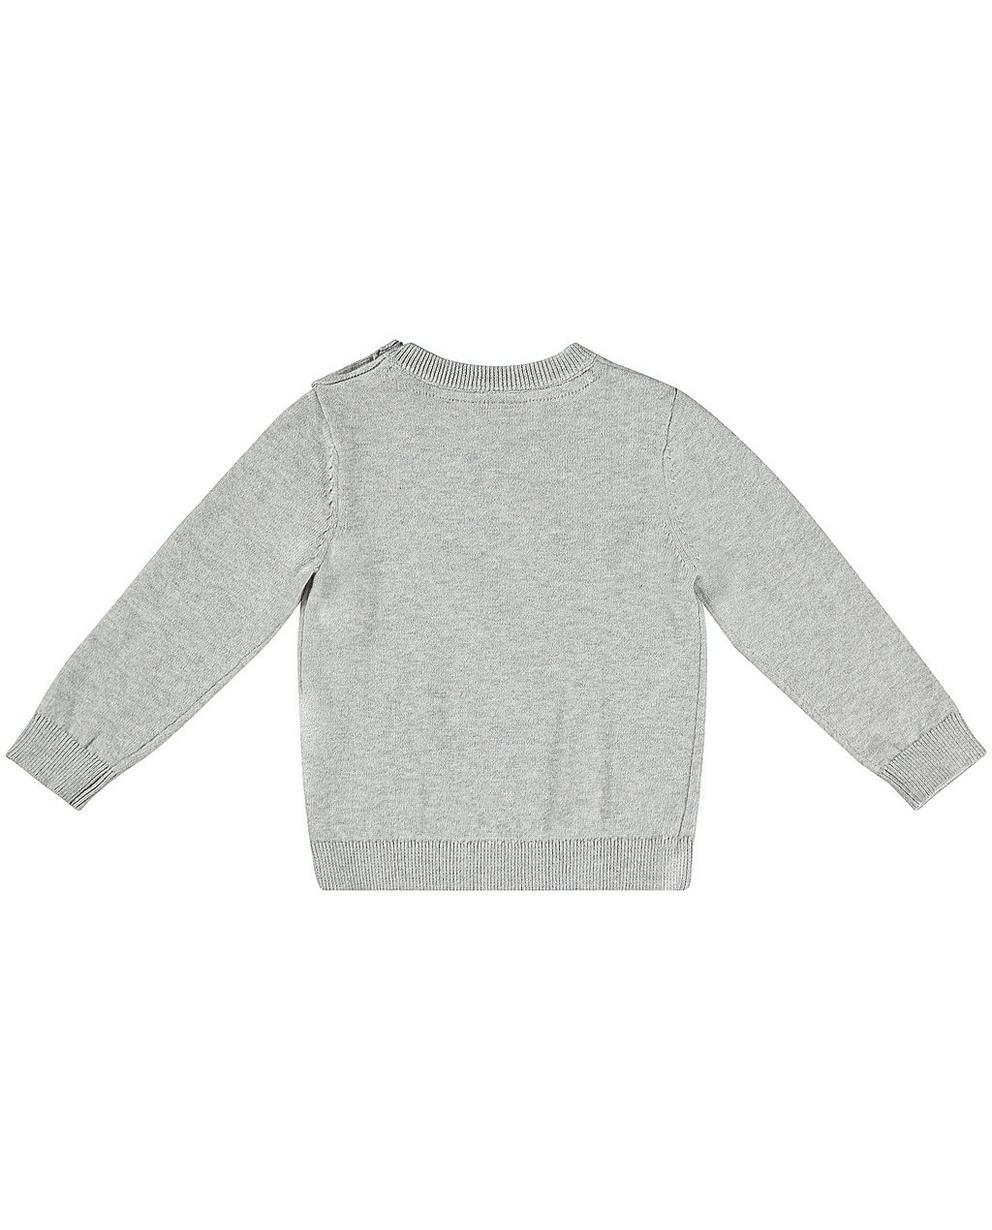 Pullover - Blassgrau - Hellgrauer Pullover